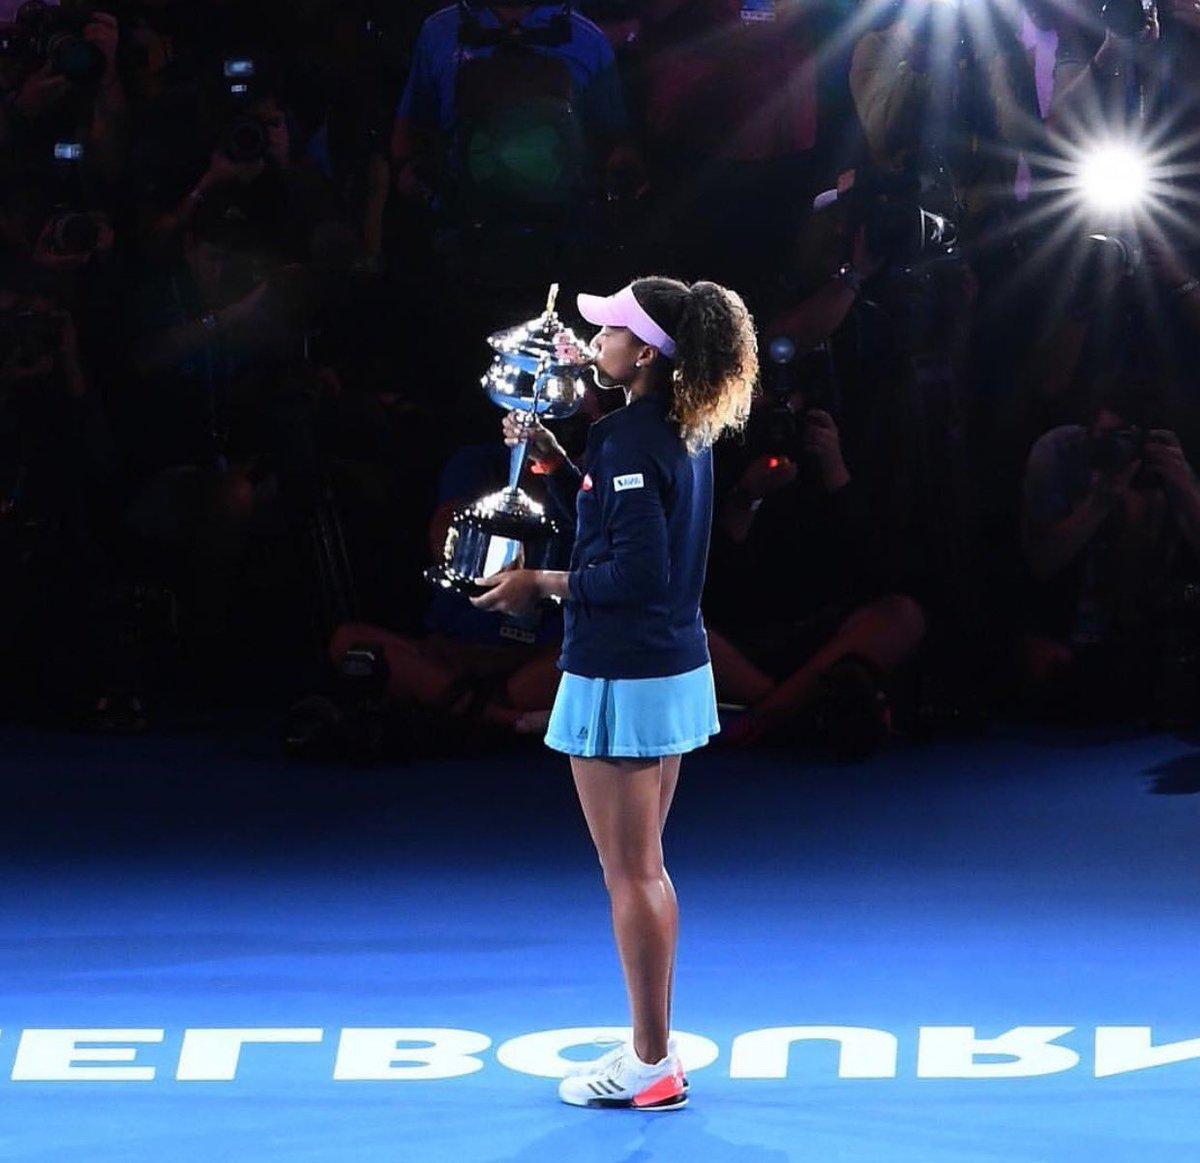 La numéro 1 mondiale Naomi Osaka. Photo: Tweeter de Naomi